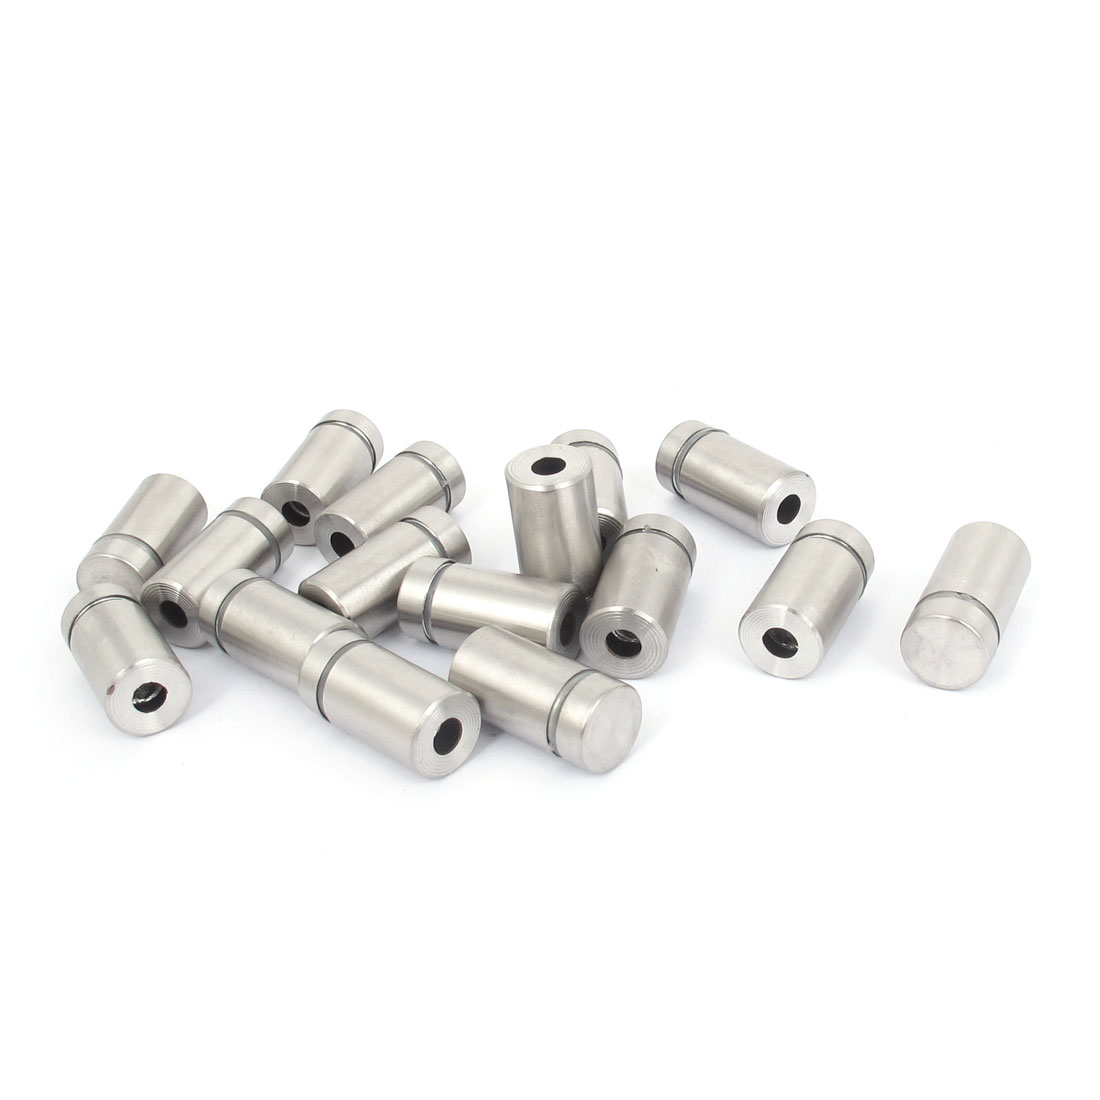 12mm x 22mm Stainless Steel Advertising Frameless Glass Standoff Pins 16pcs